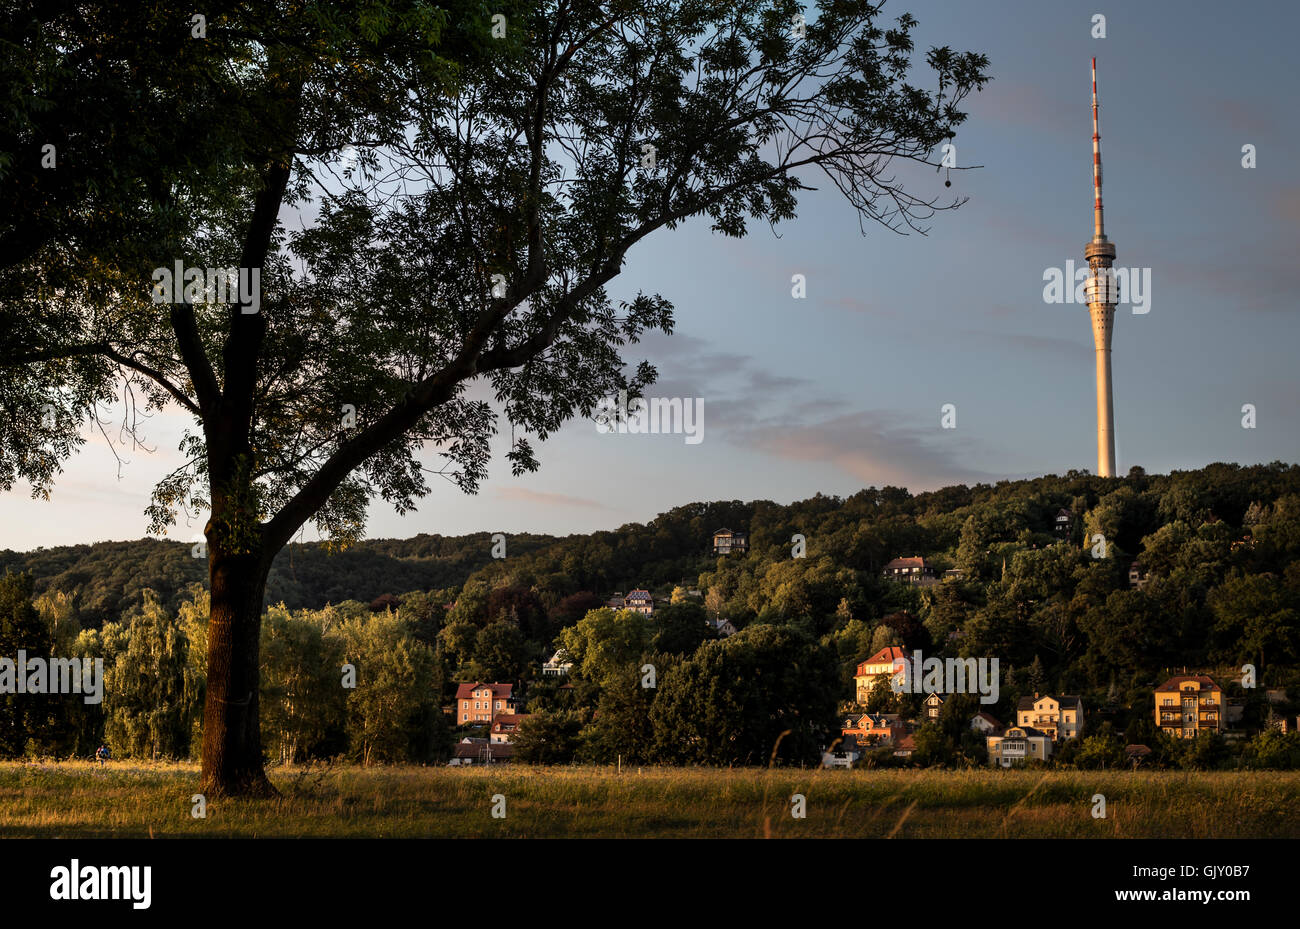 Margem do Rio Elba, vista para o 'Fernsehturm, Dresden, Saxónia, Alemanha (dresden elba torre de tv panorama). Imagens de Stock